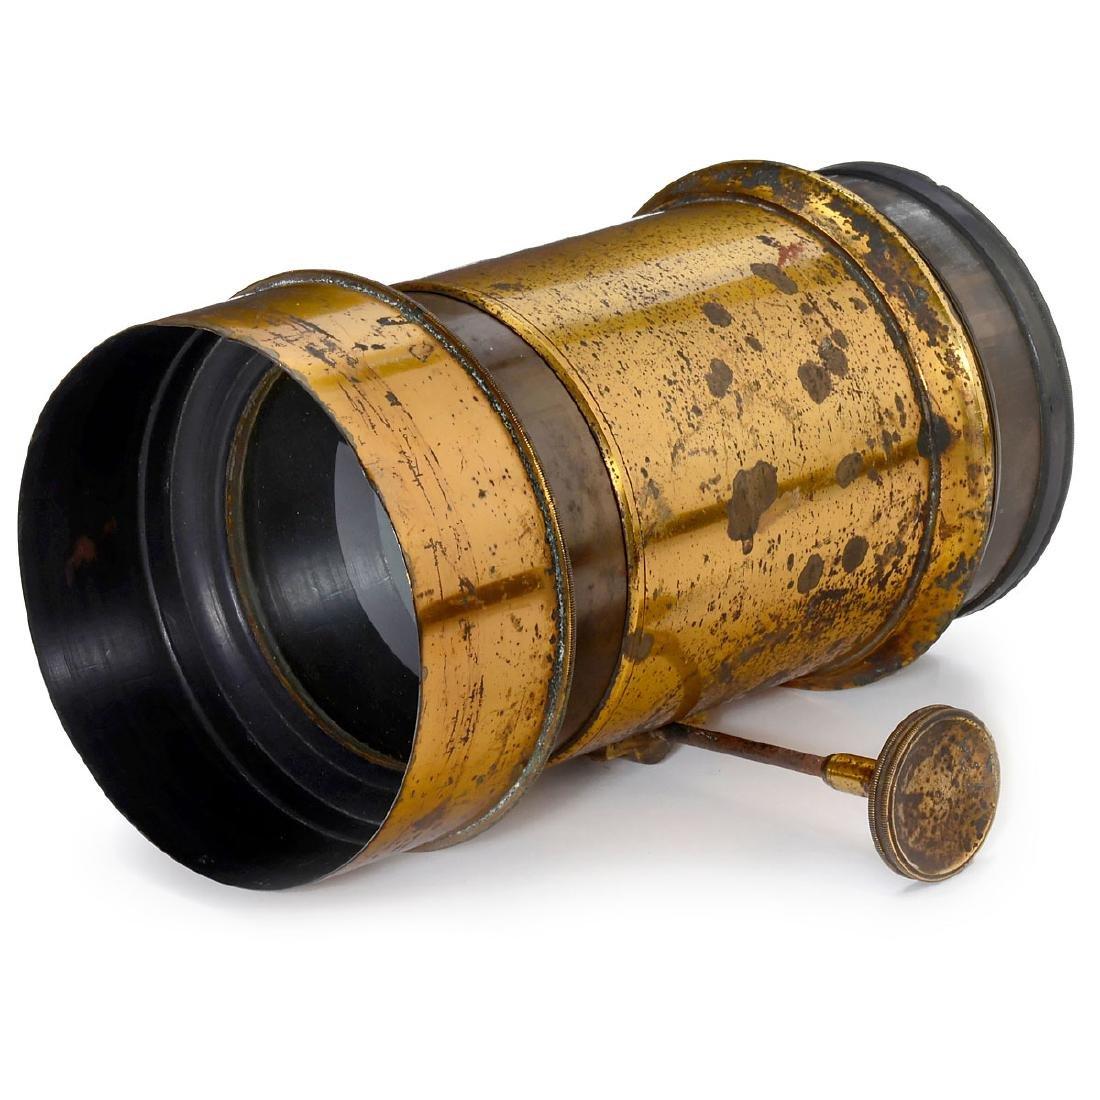 Petzval-Type Lens by James Davidson, Scotland, c. 1855